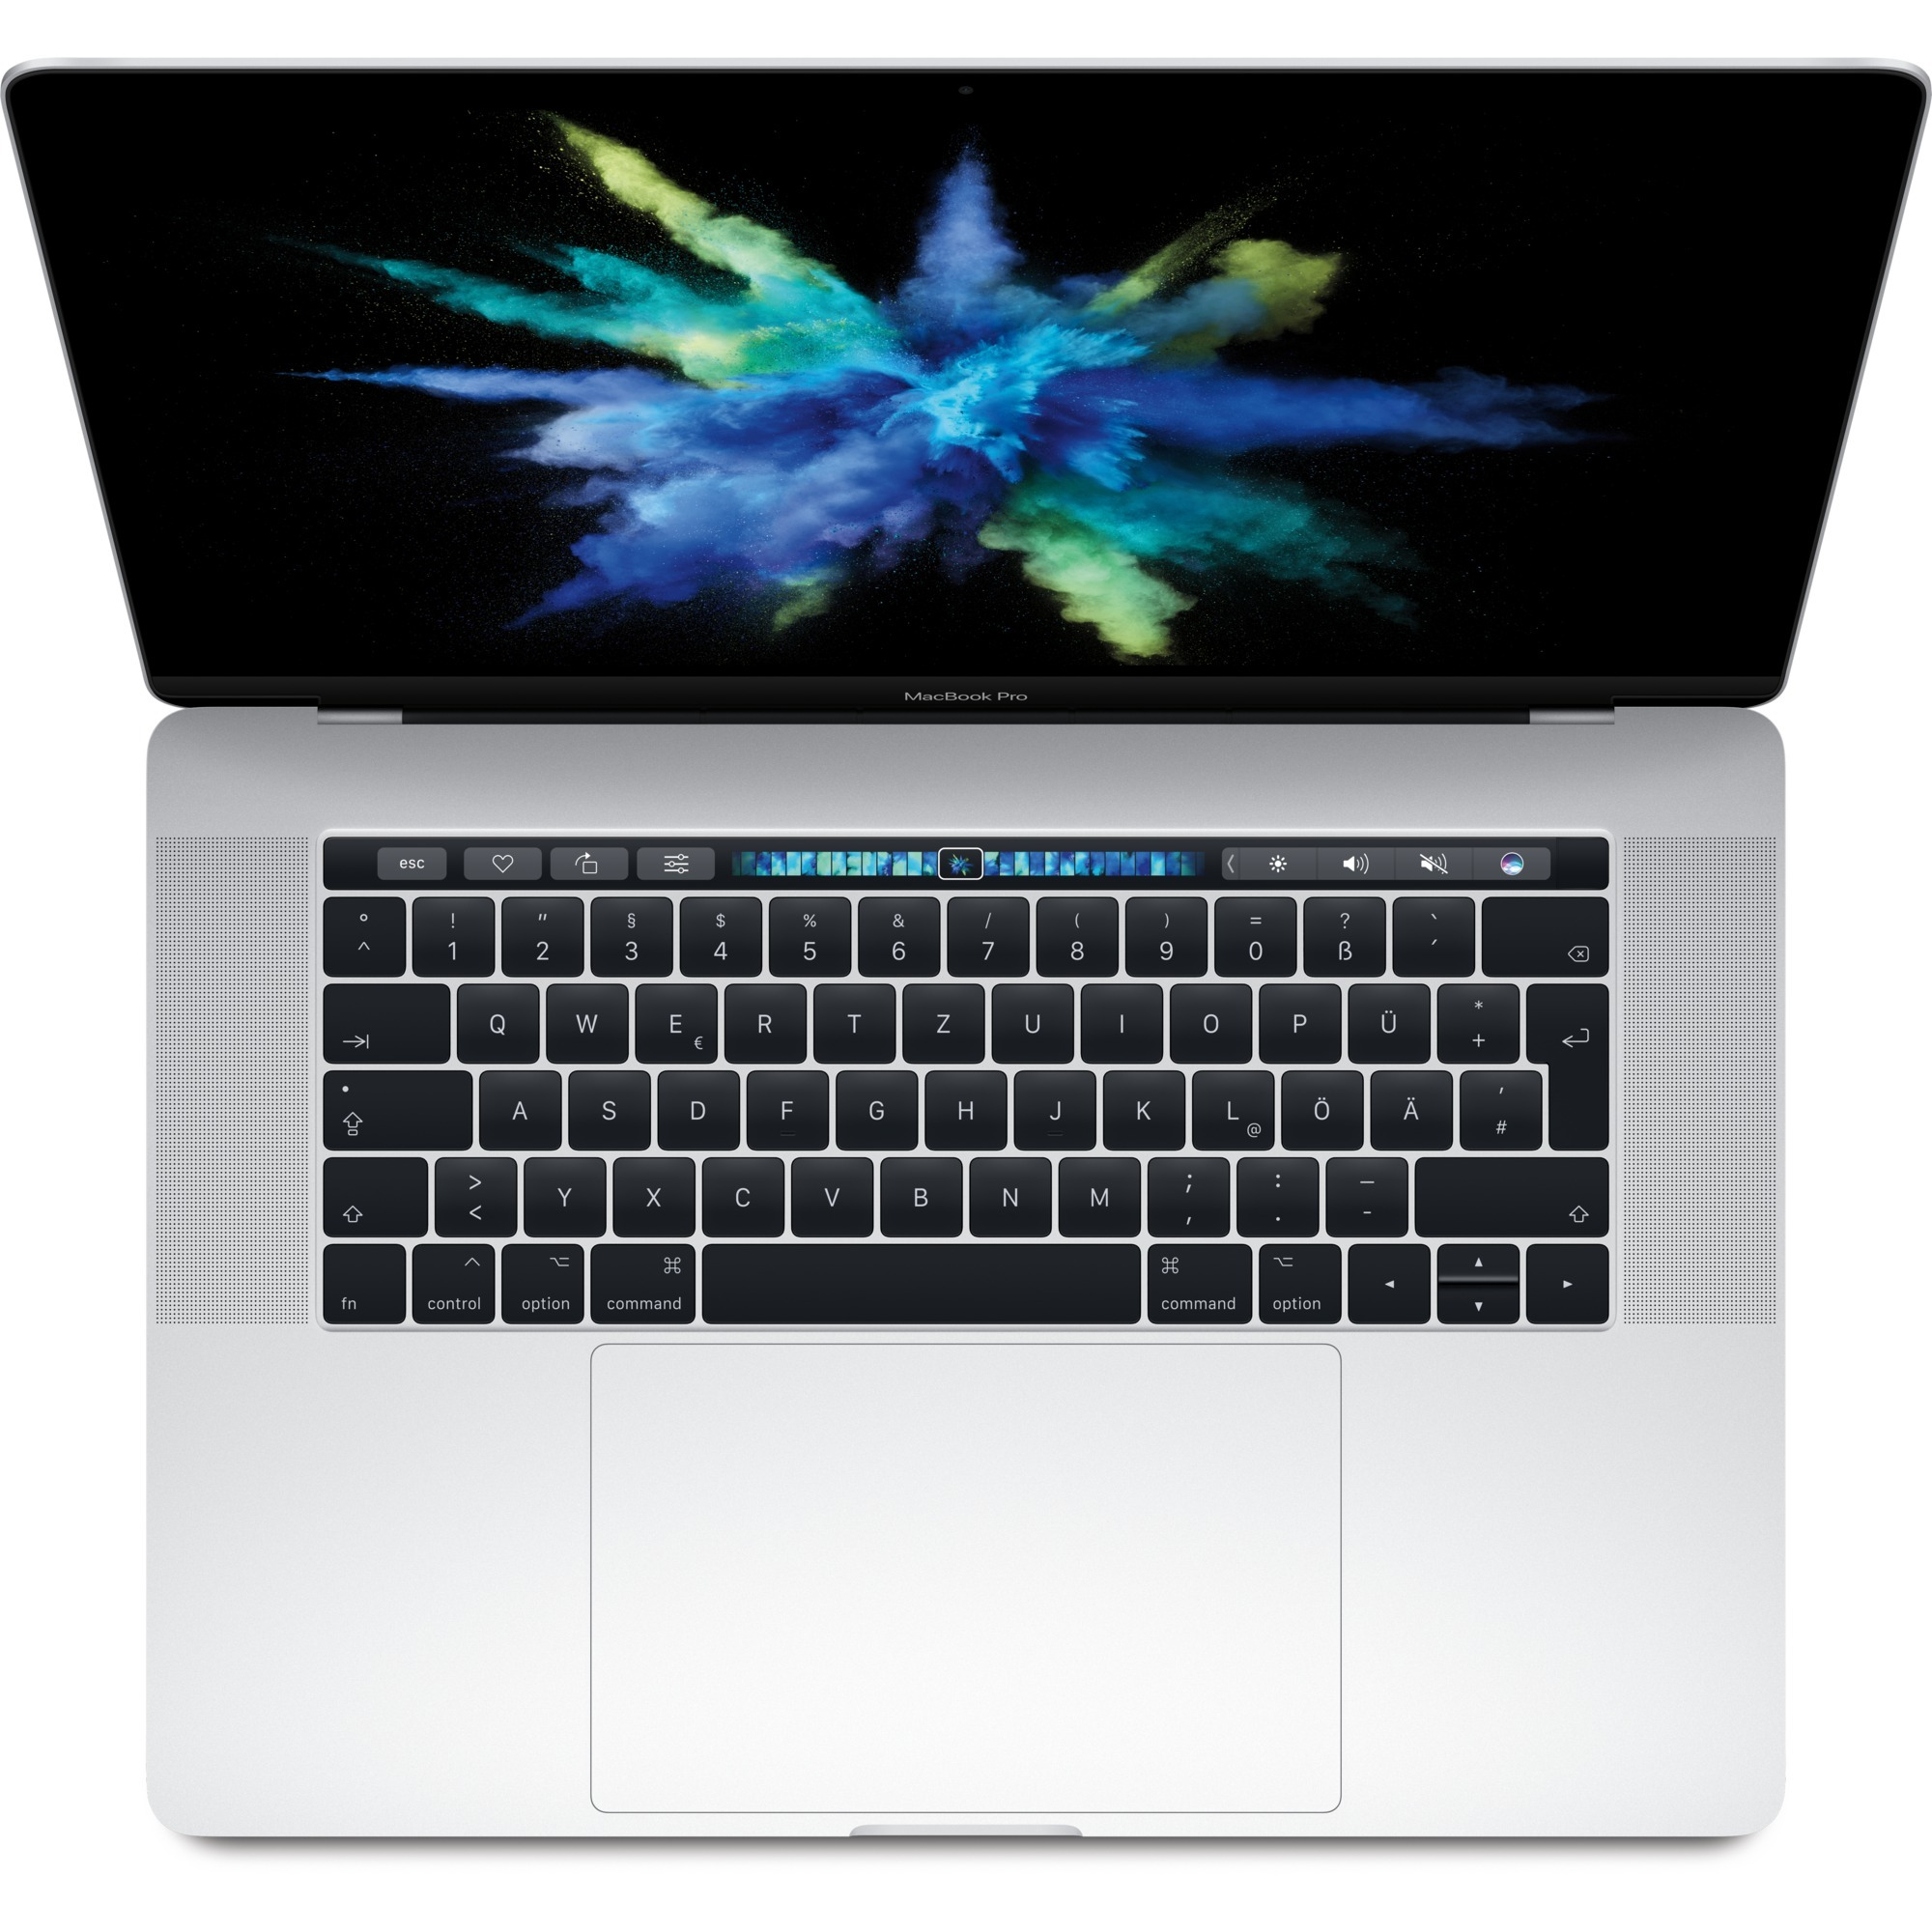 "MacBook Pro Plata Portátil 39,1 cm (15.4"") 2880 x 1800 Pixeles 2,2 GHz 8ª generación de procesadores Intel Core i7"